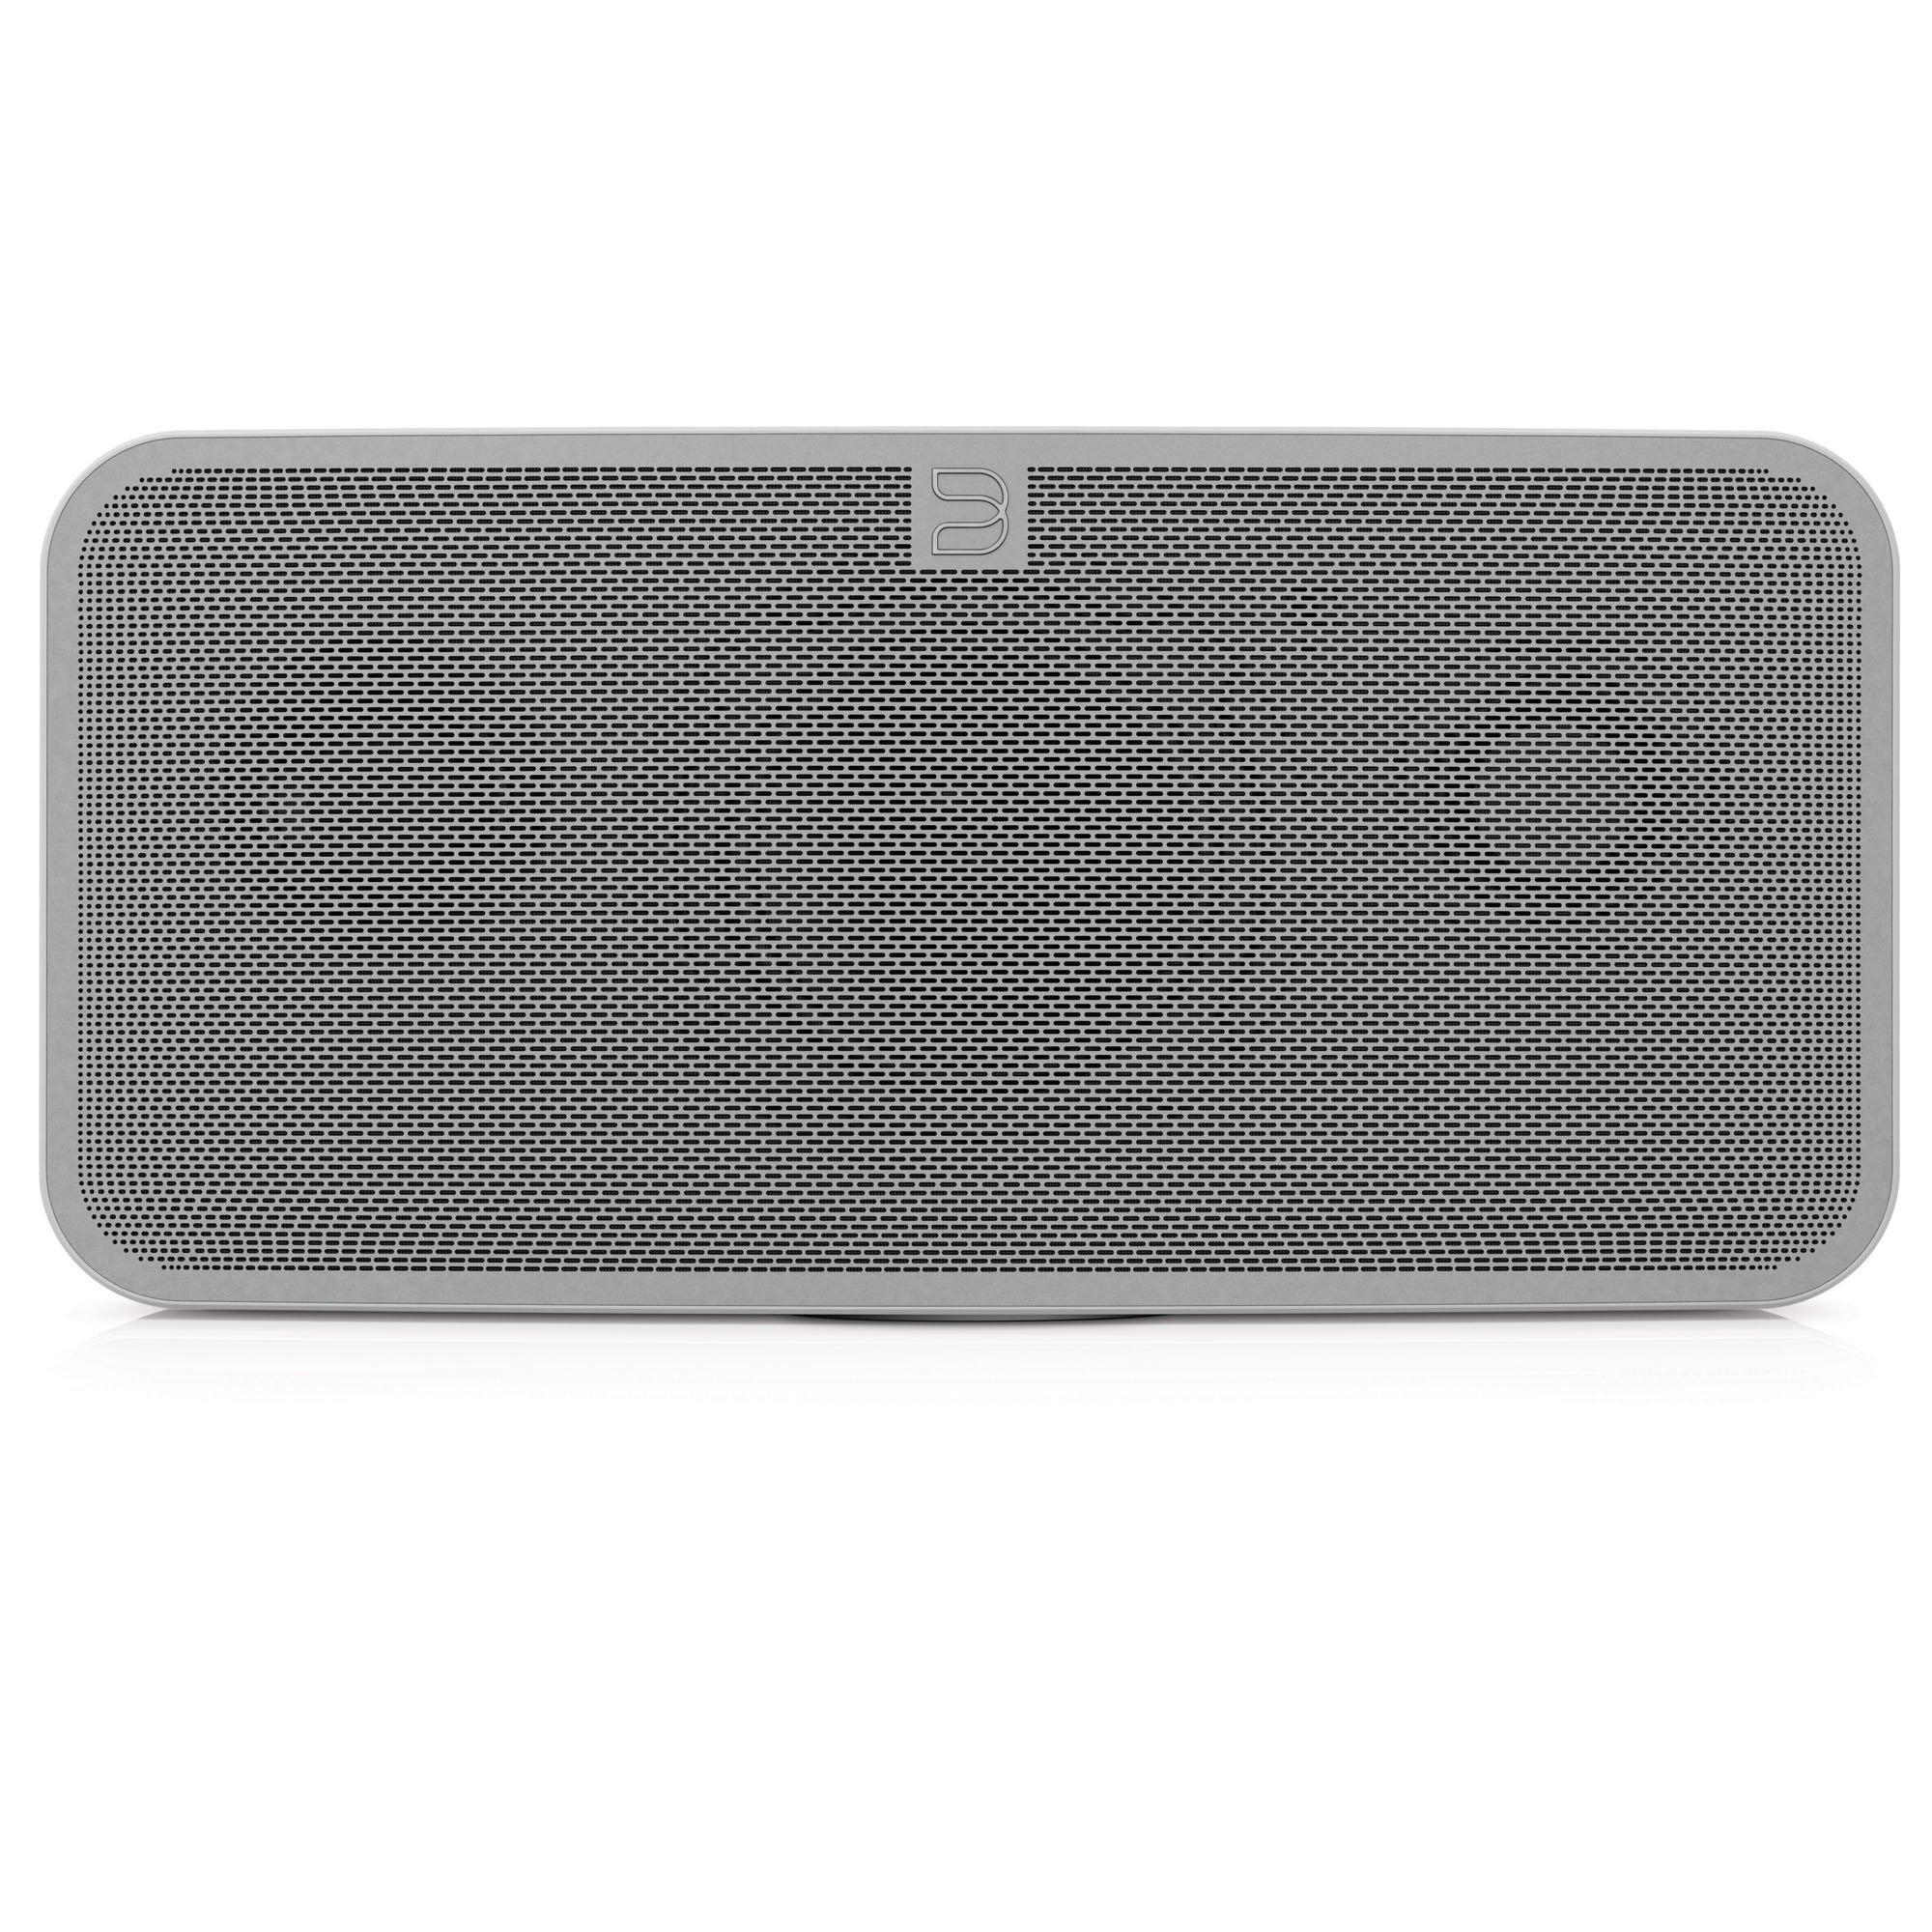 Bluesound PULSE 2 Wireless Multi-room Smart Speaker with Bluetooth - White